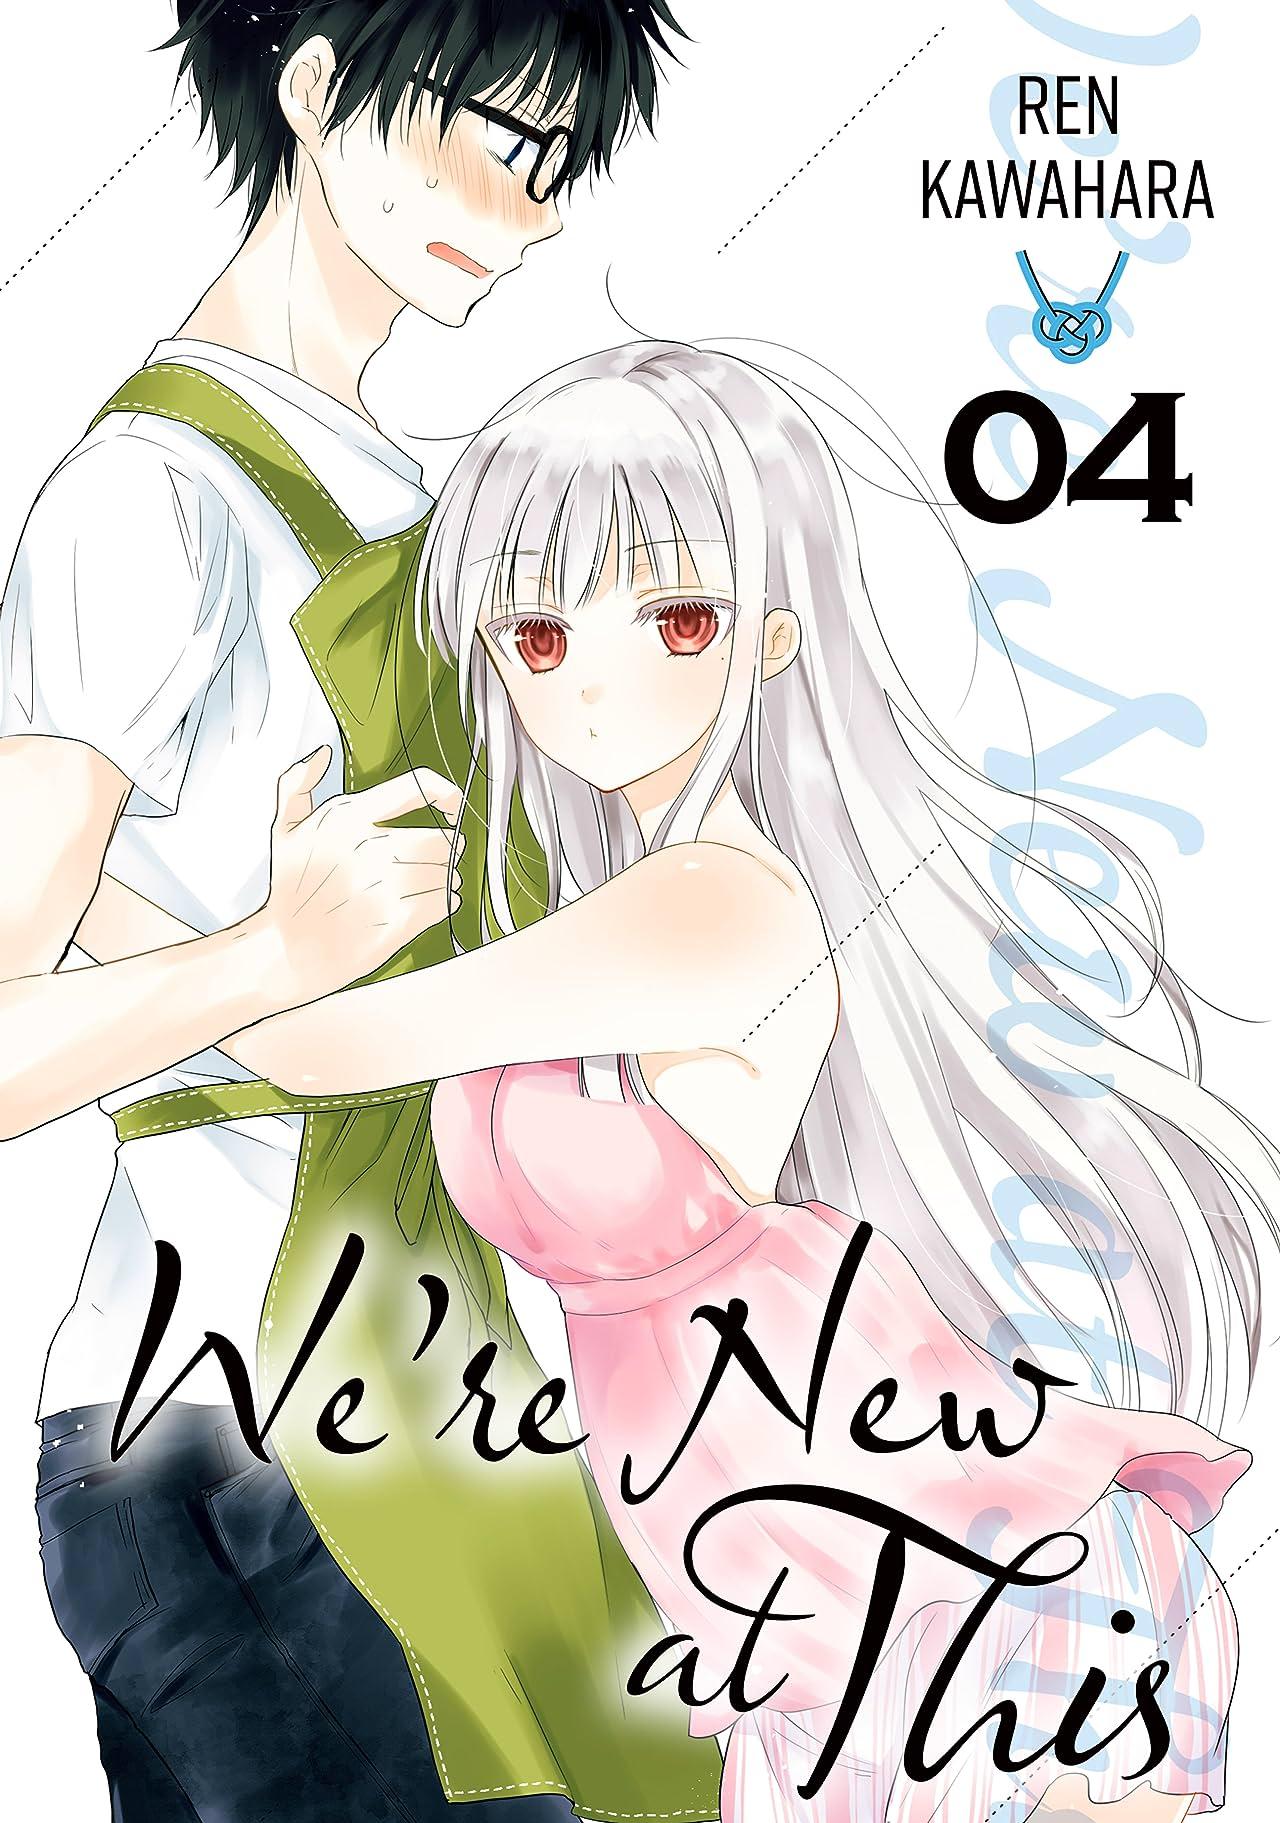 We're New at This Vol. 4